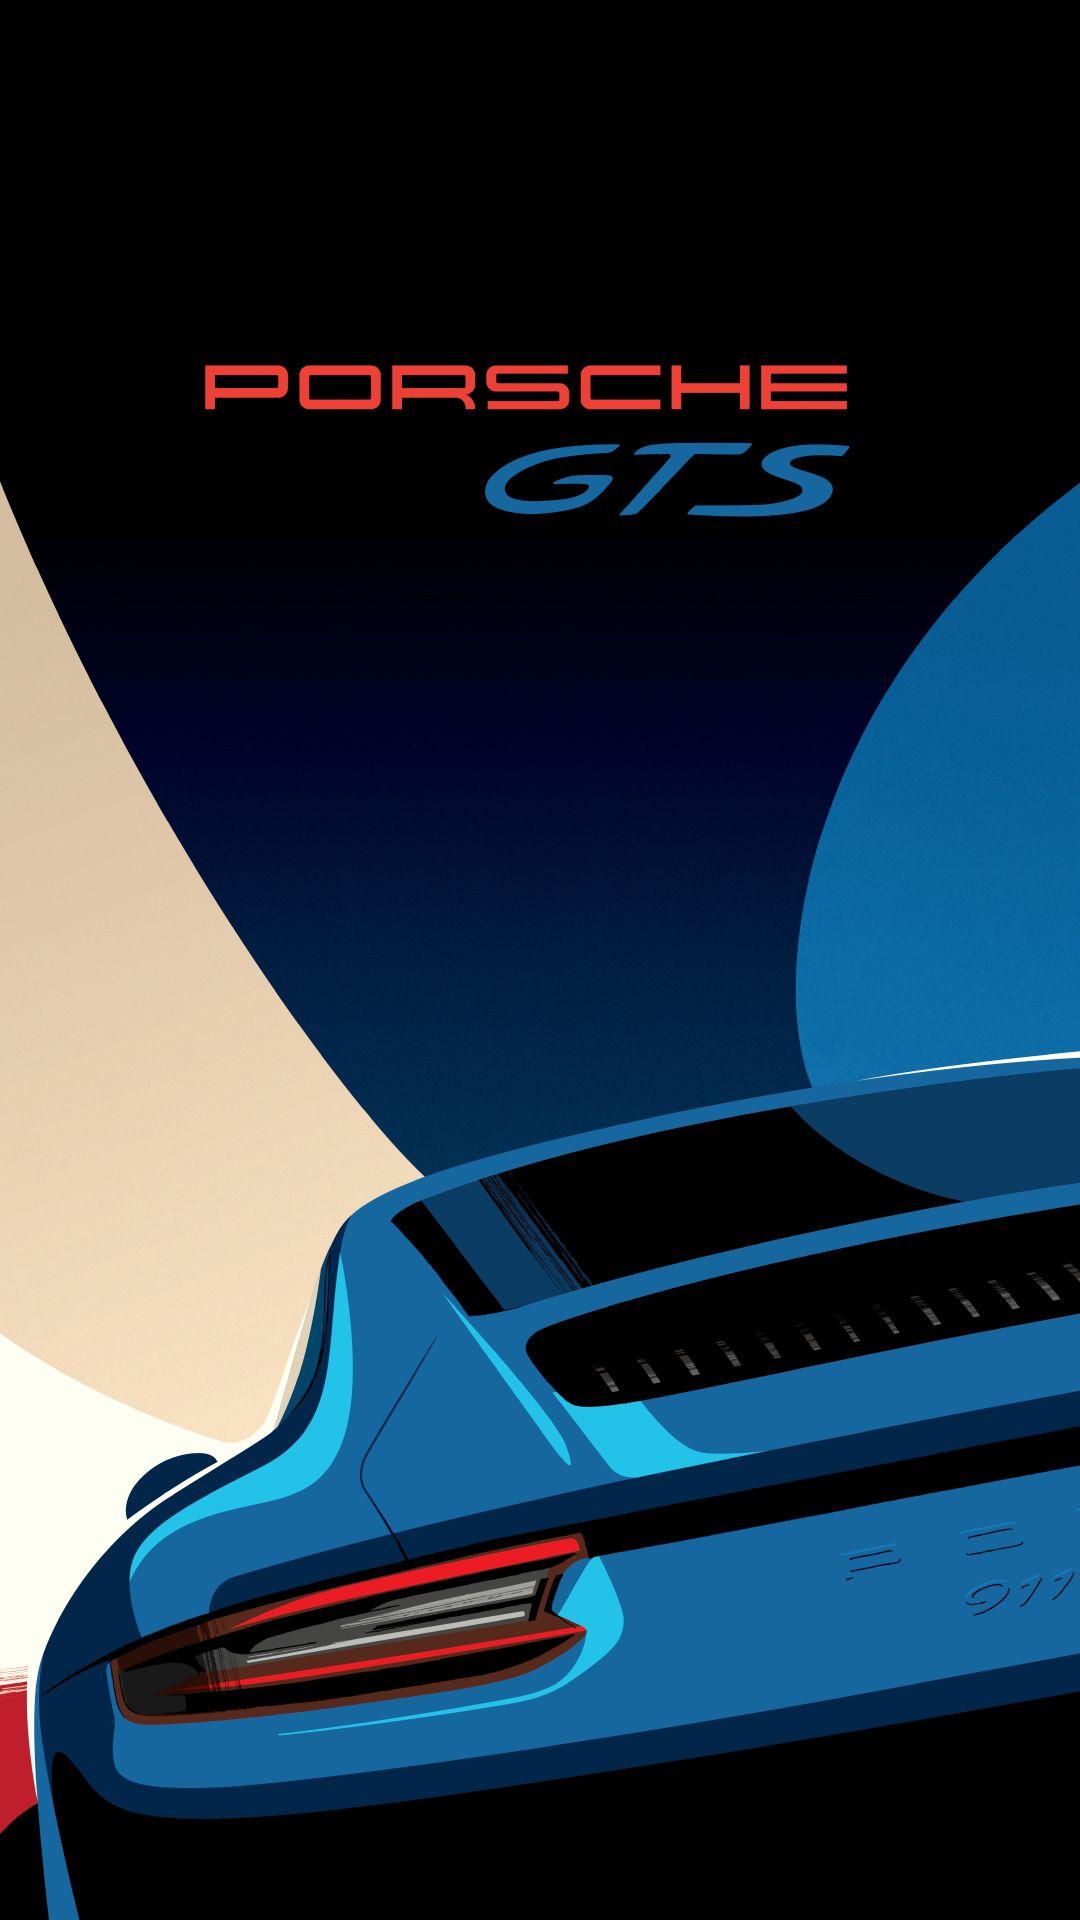 Check It Out Porsche Goes Retro On Social Strategy In 2020 Porsche Gts Retro Cars Car Iphone Wallpaper